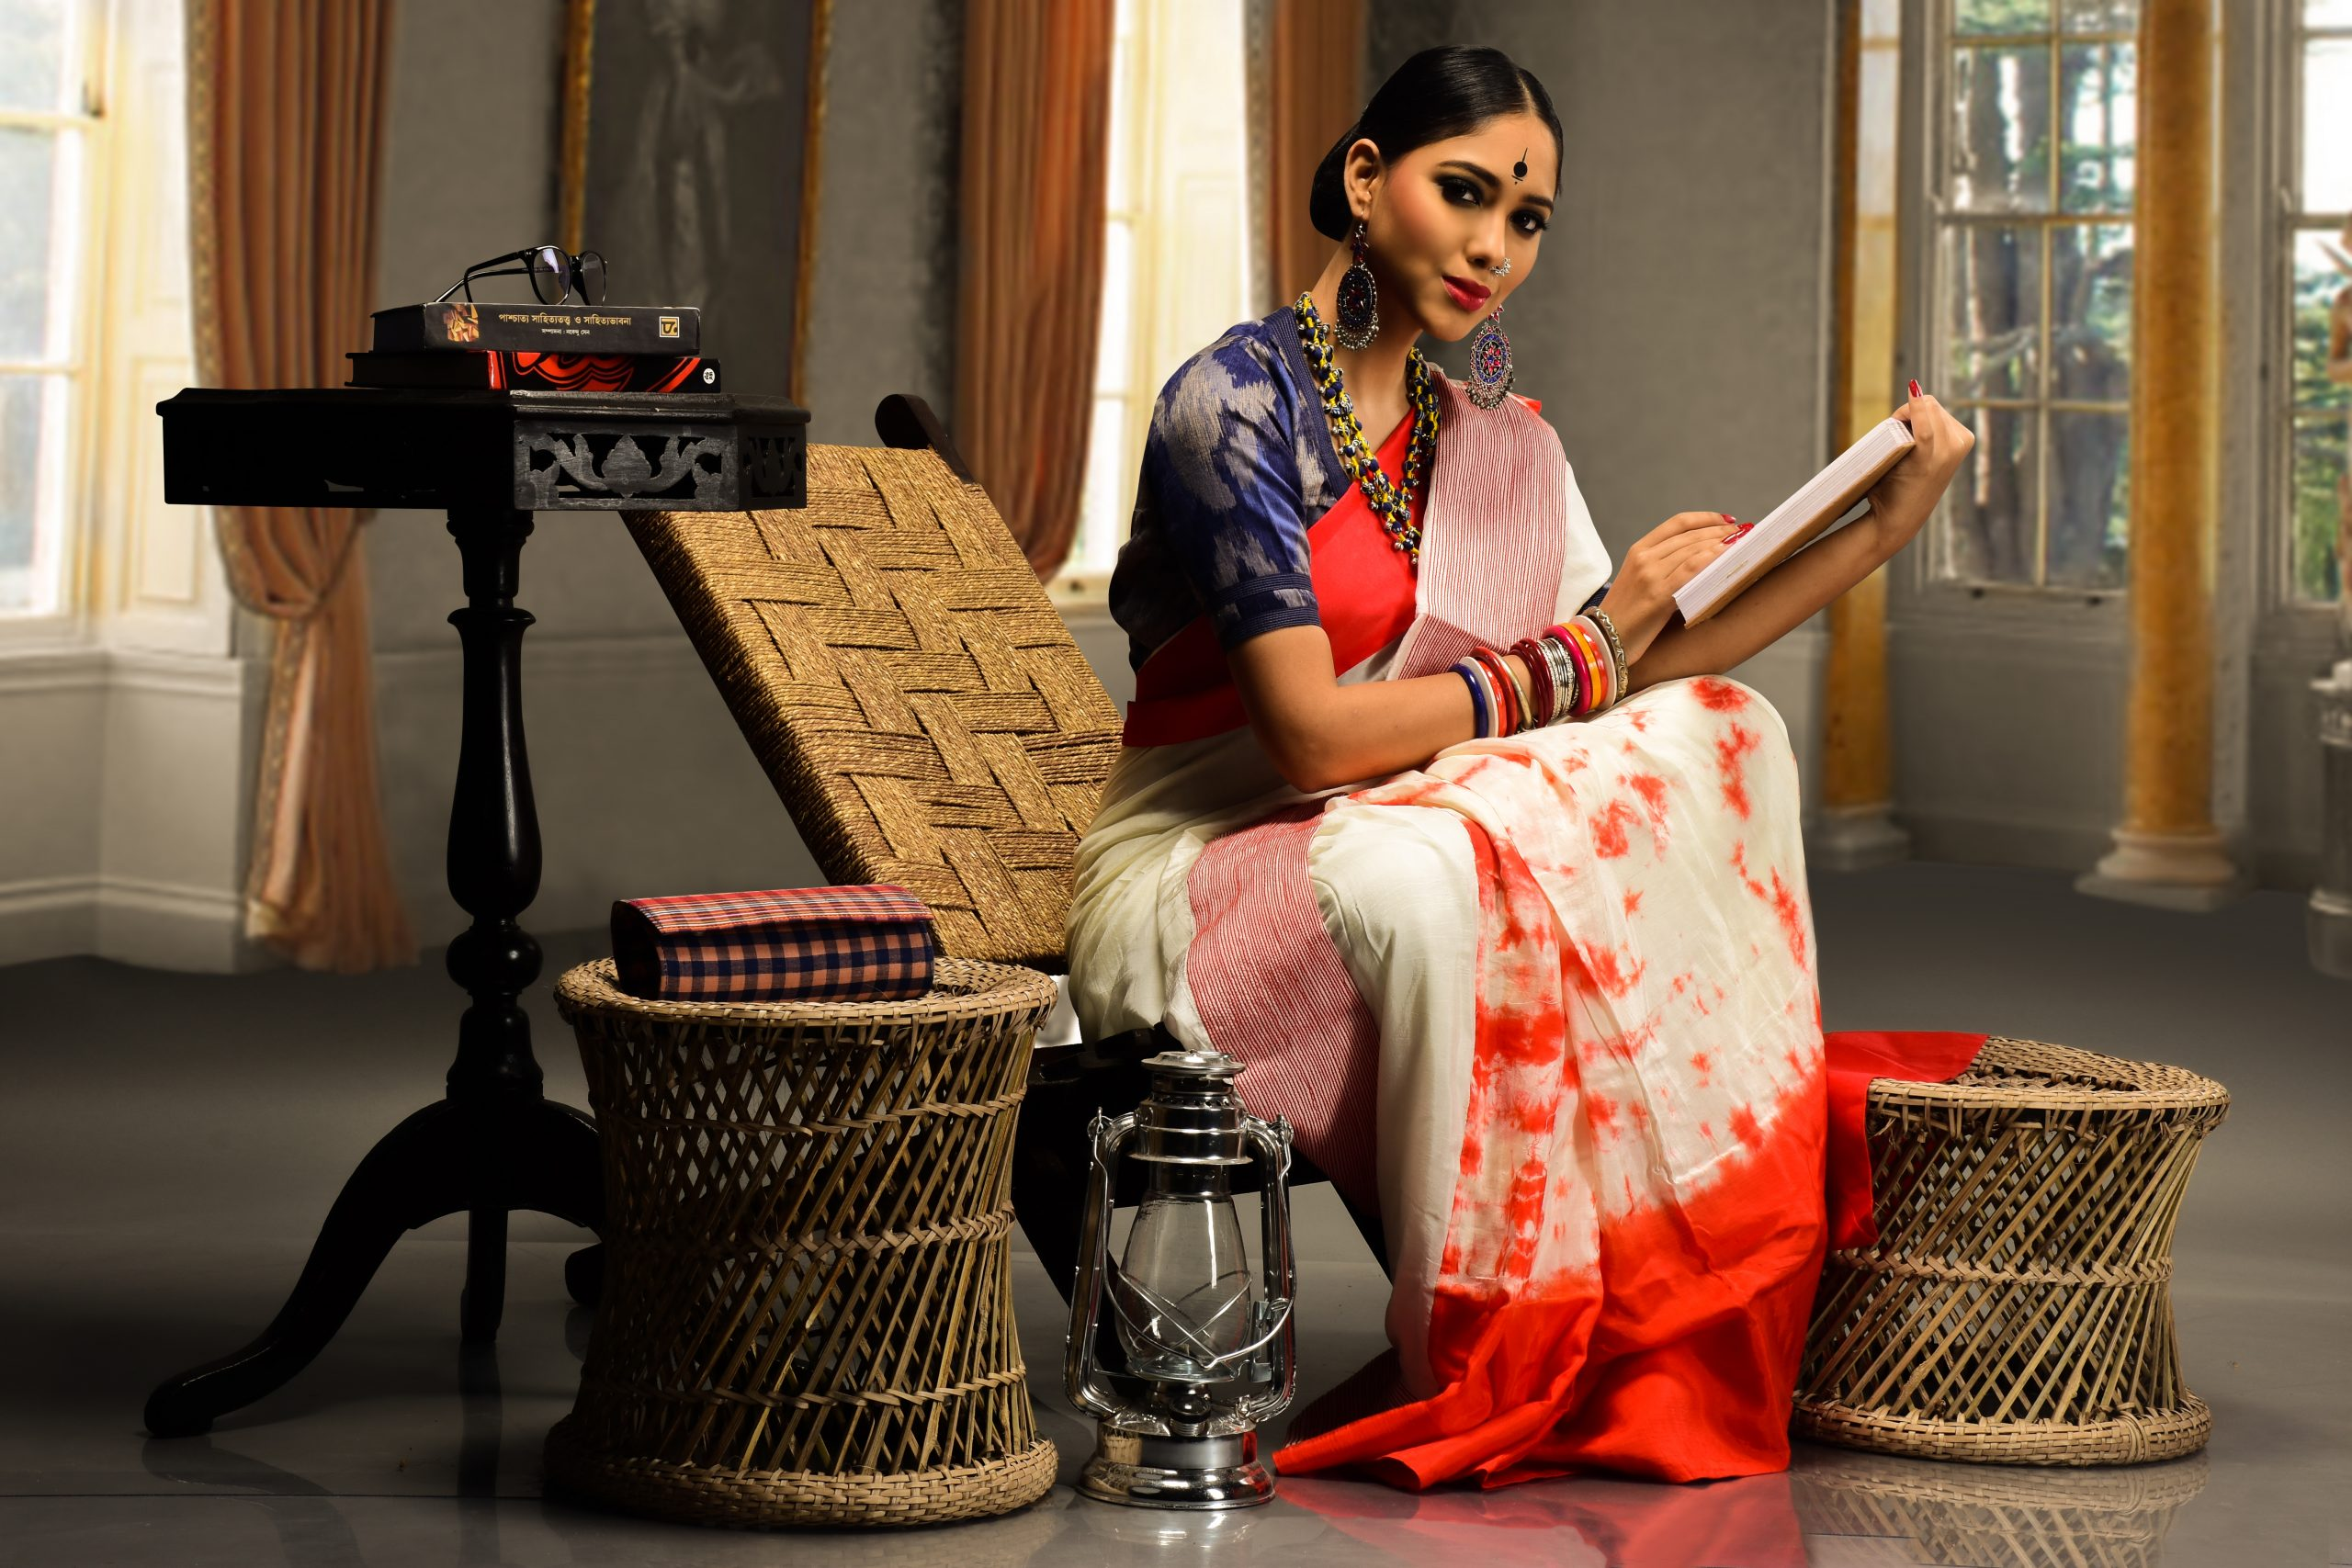 An Indian woman writing